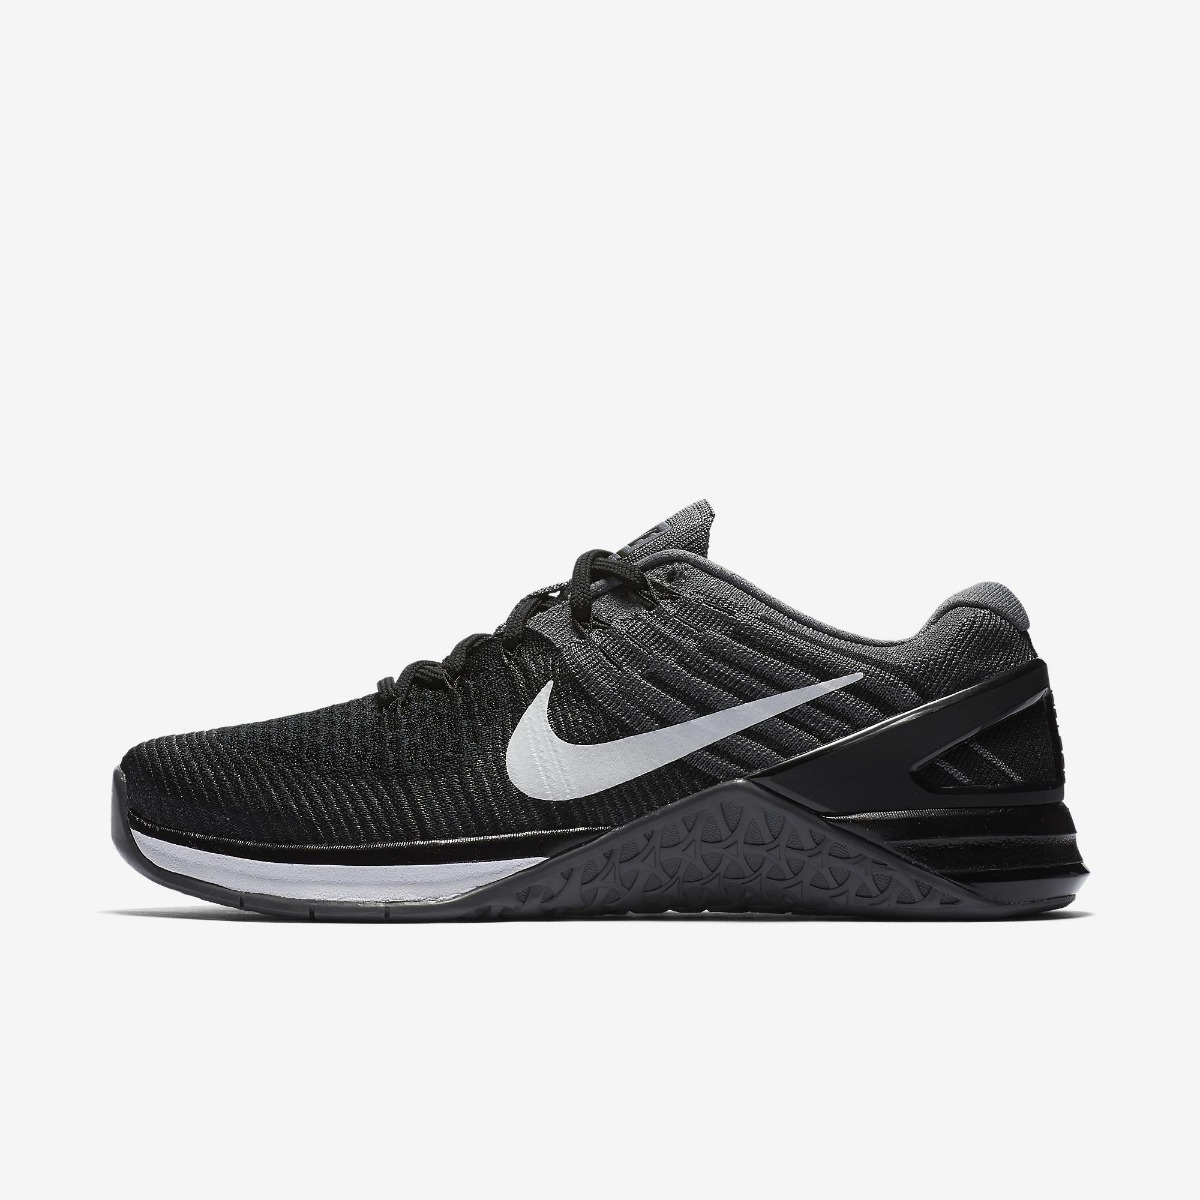 f057e7d2252 Tênis Nike Metcon Dsx Flyknit - Treino - Crossfit - Original - R ...